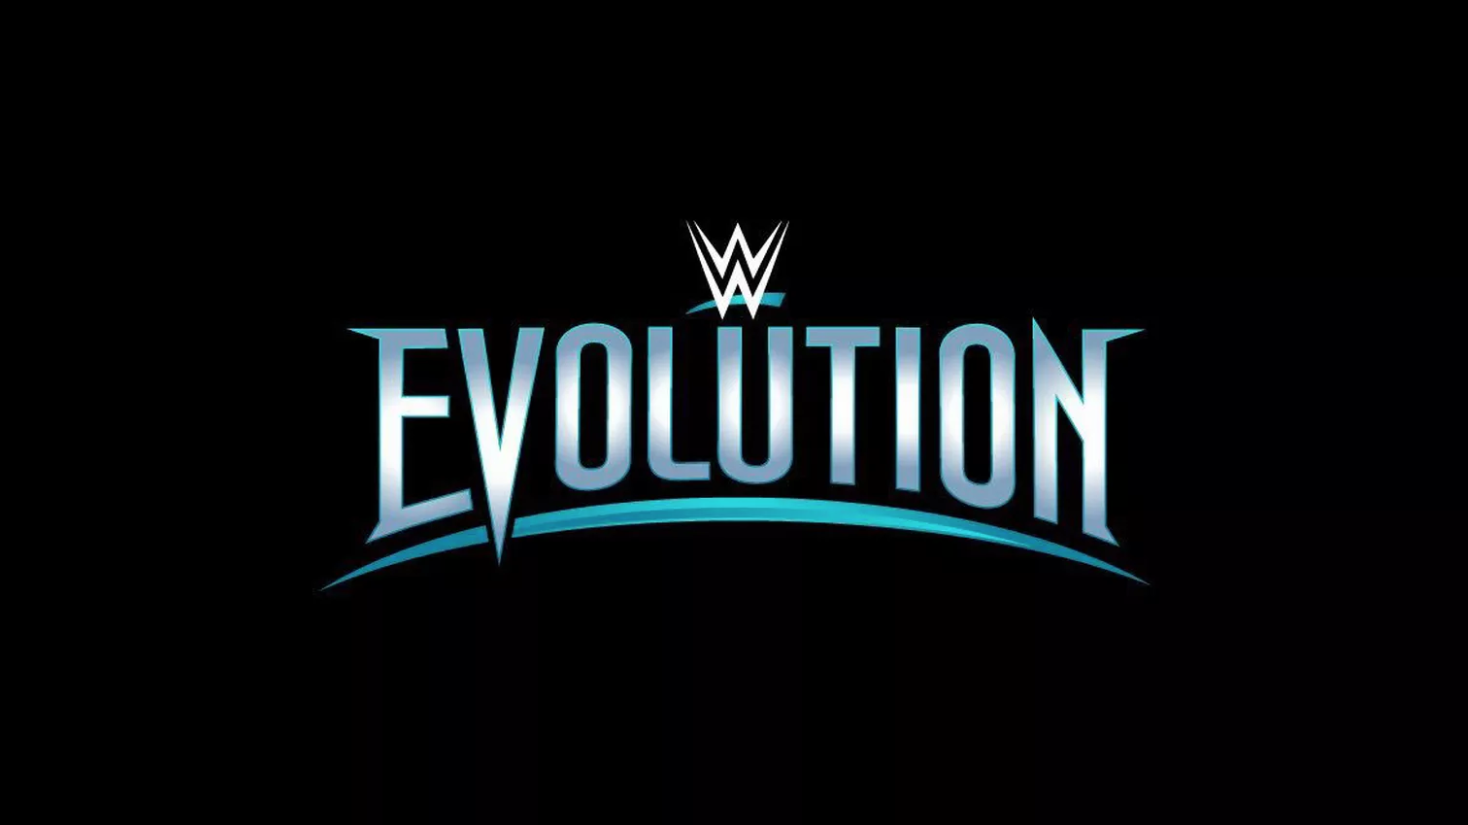 wwe-evolution_1nvadyhj4pagz141syq7e63g1k